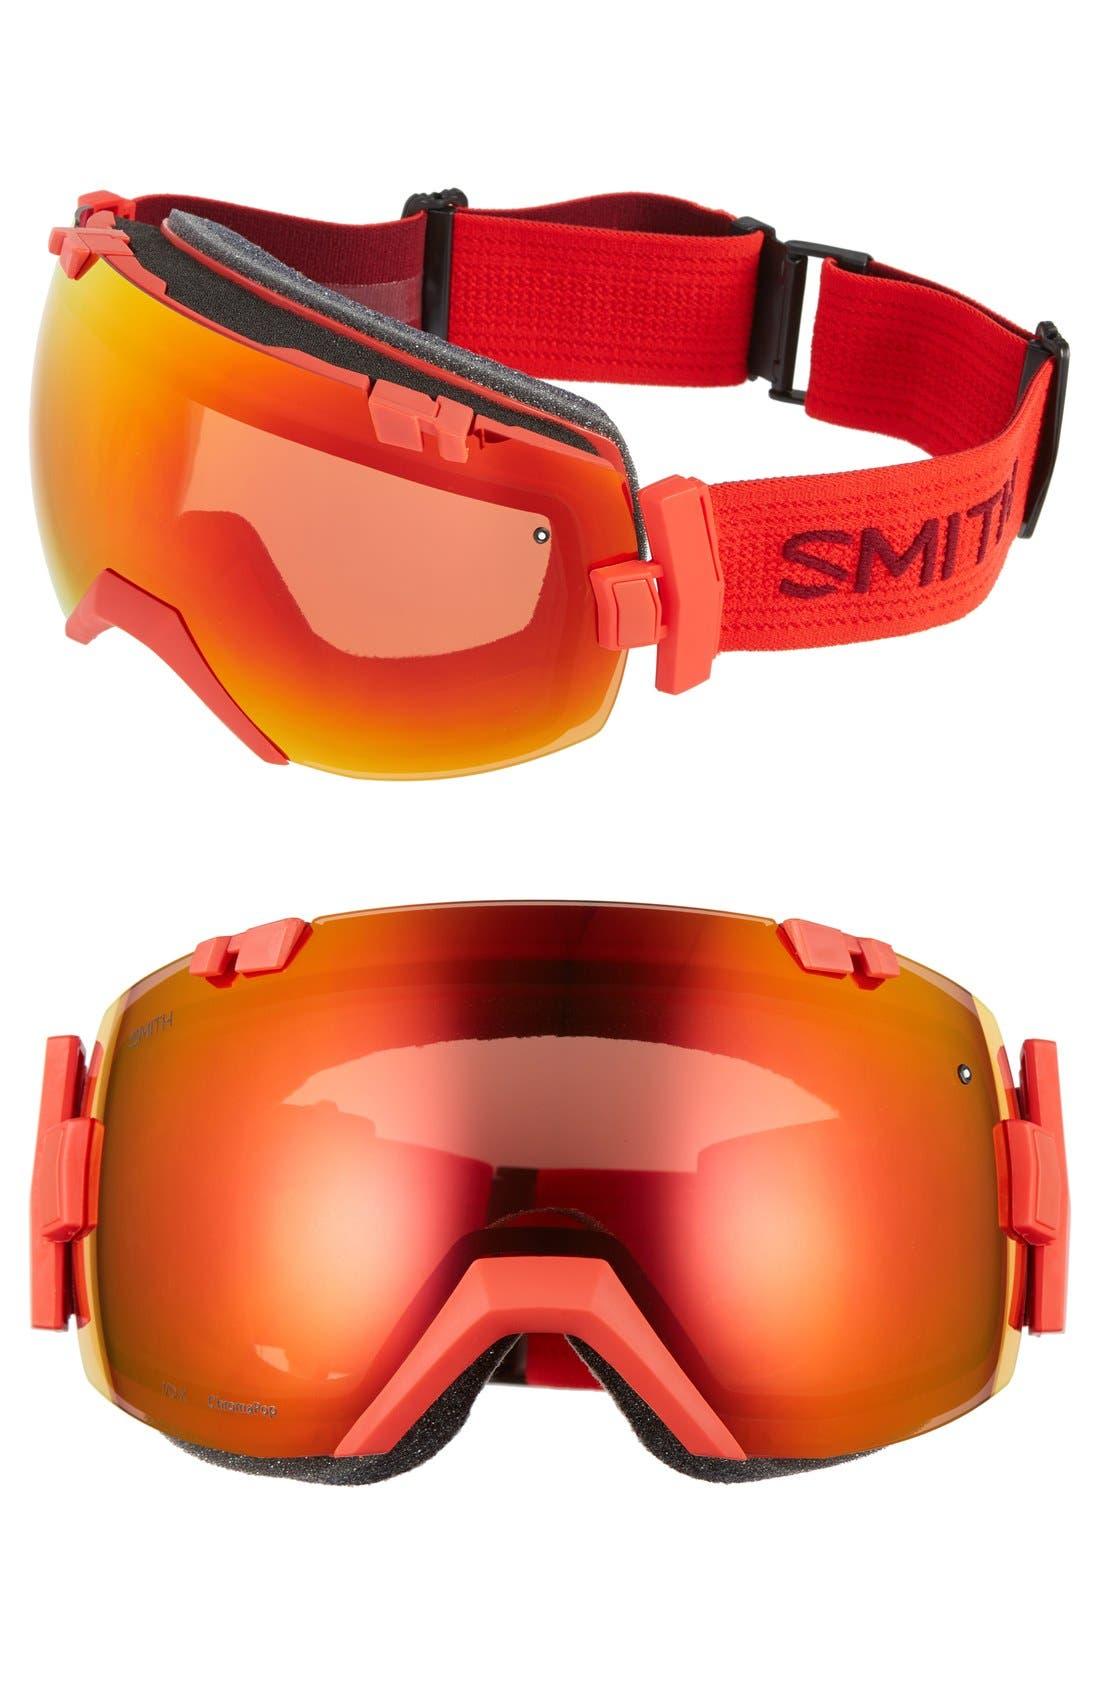 Smith I/OX 205mm Snow Goggles